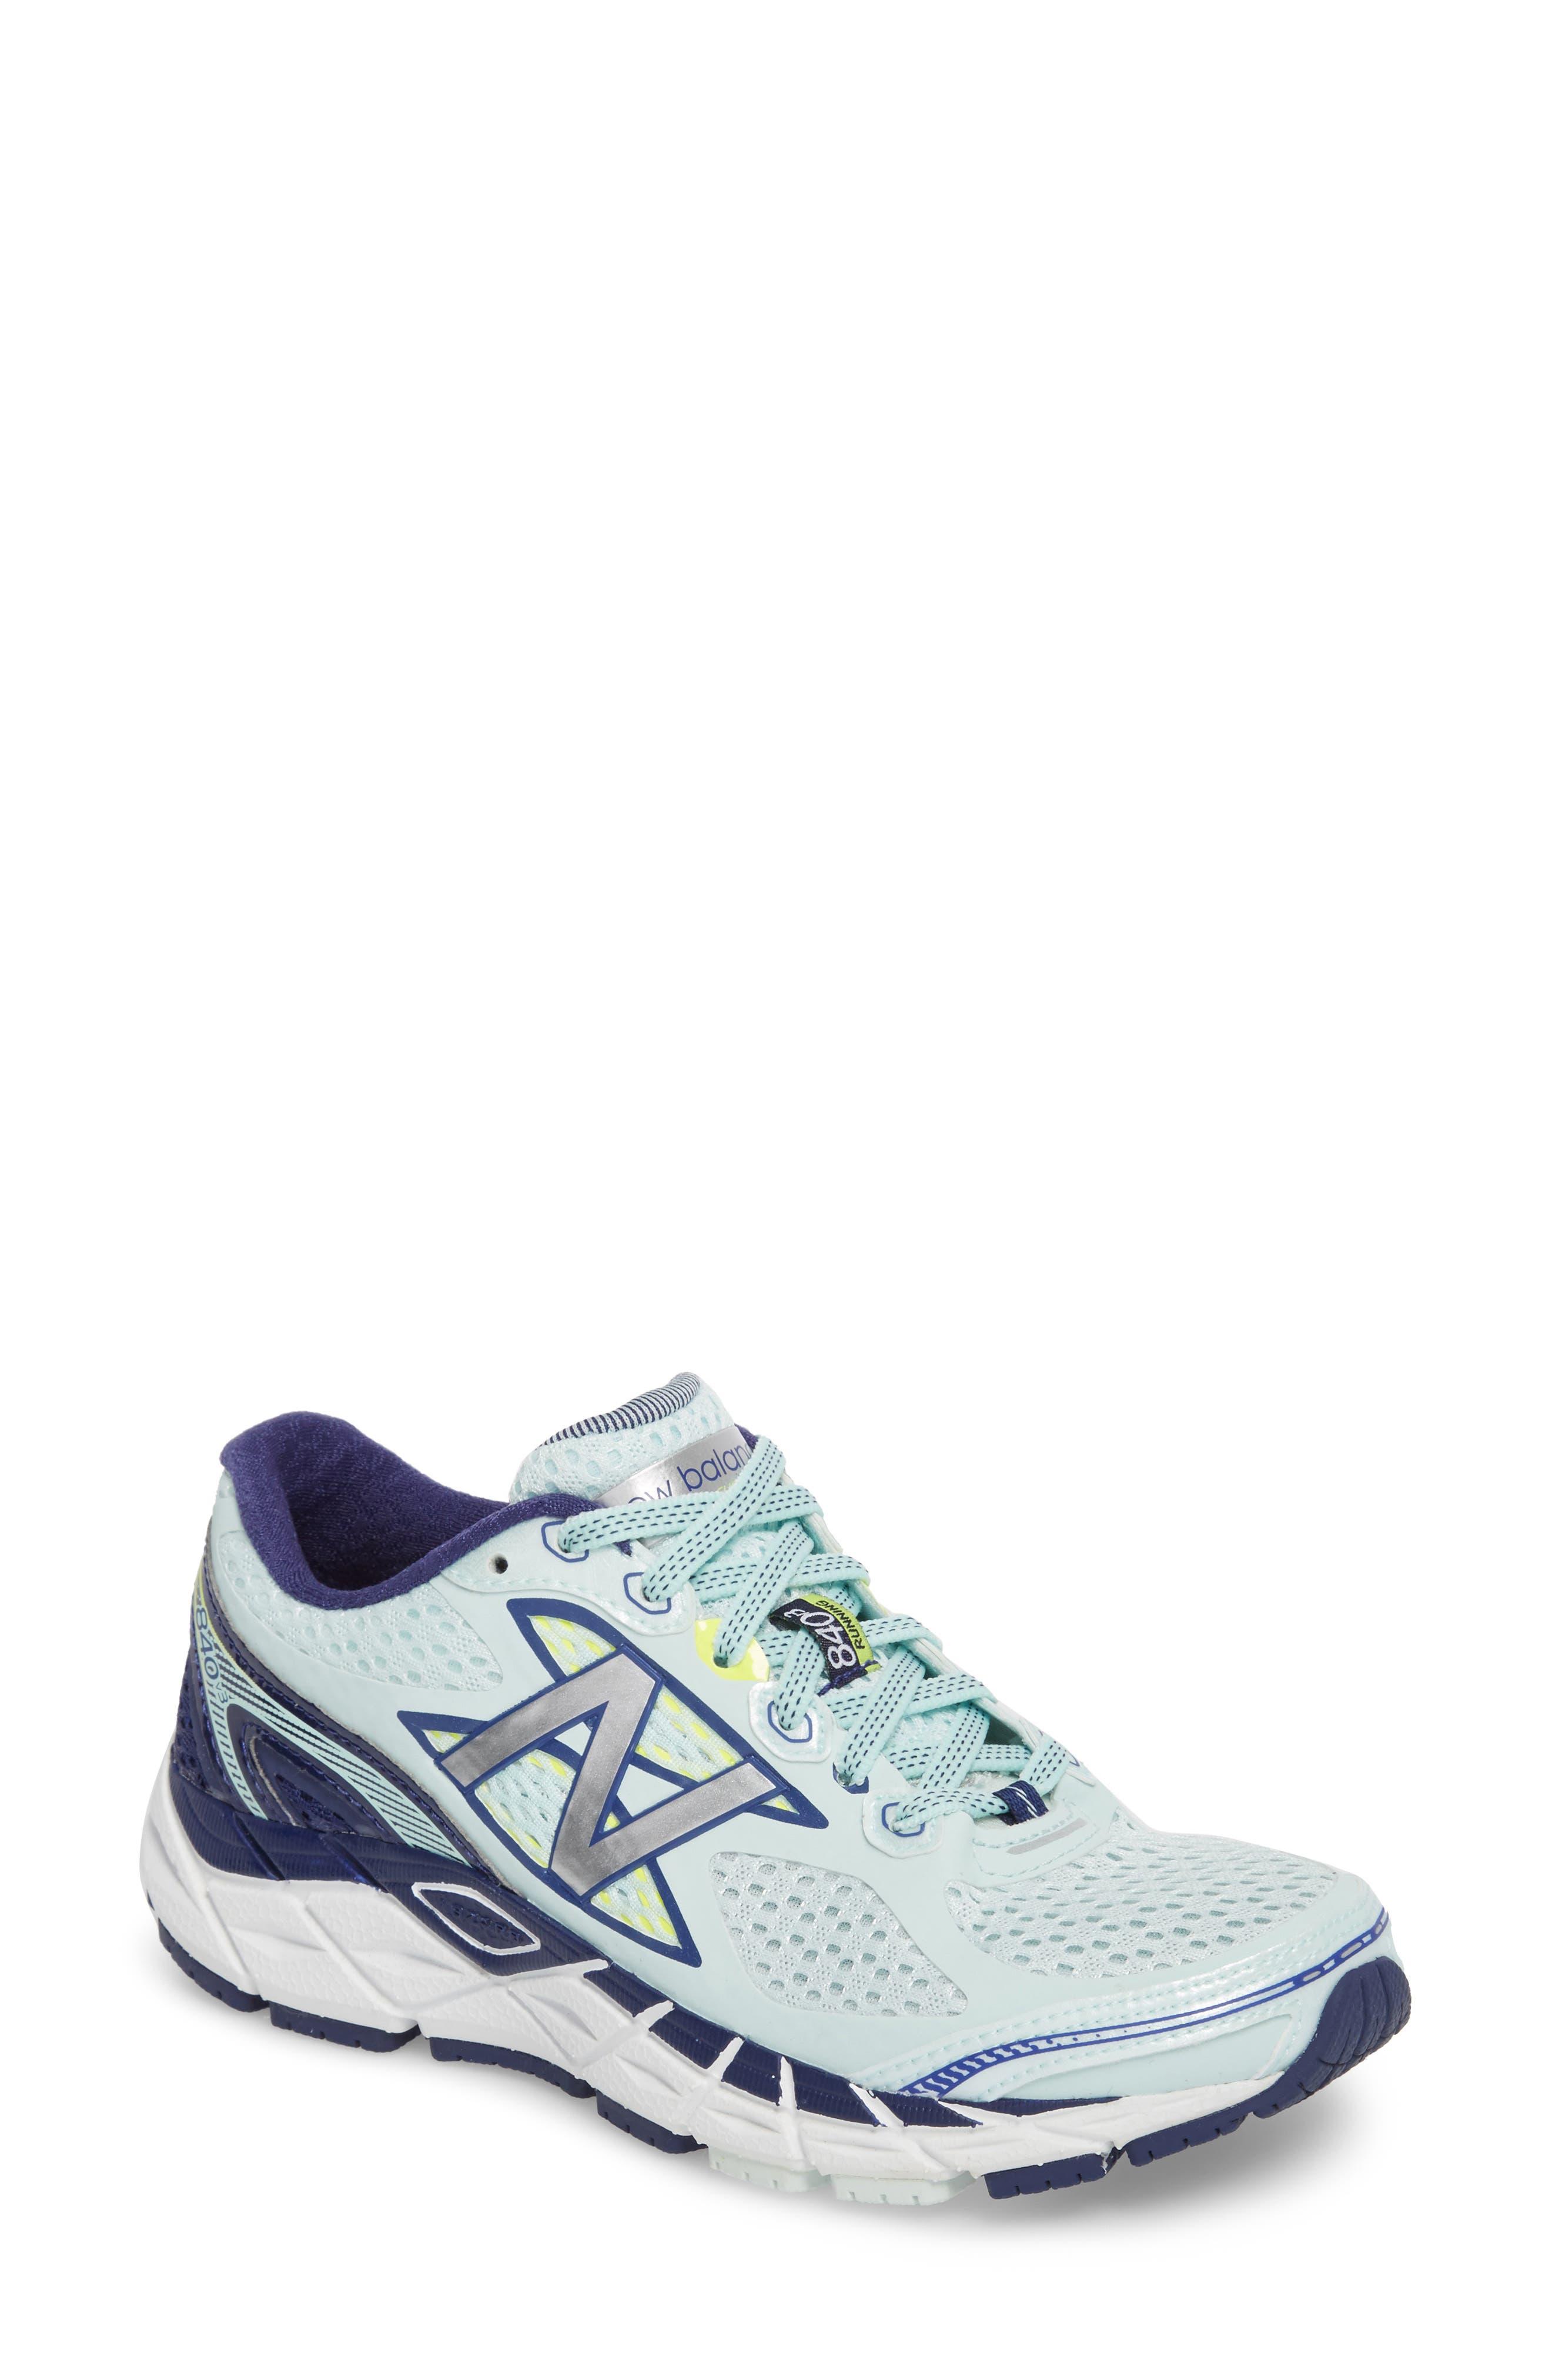 '840v3' Running Shoe,                         Main,                         color, 487